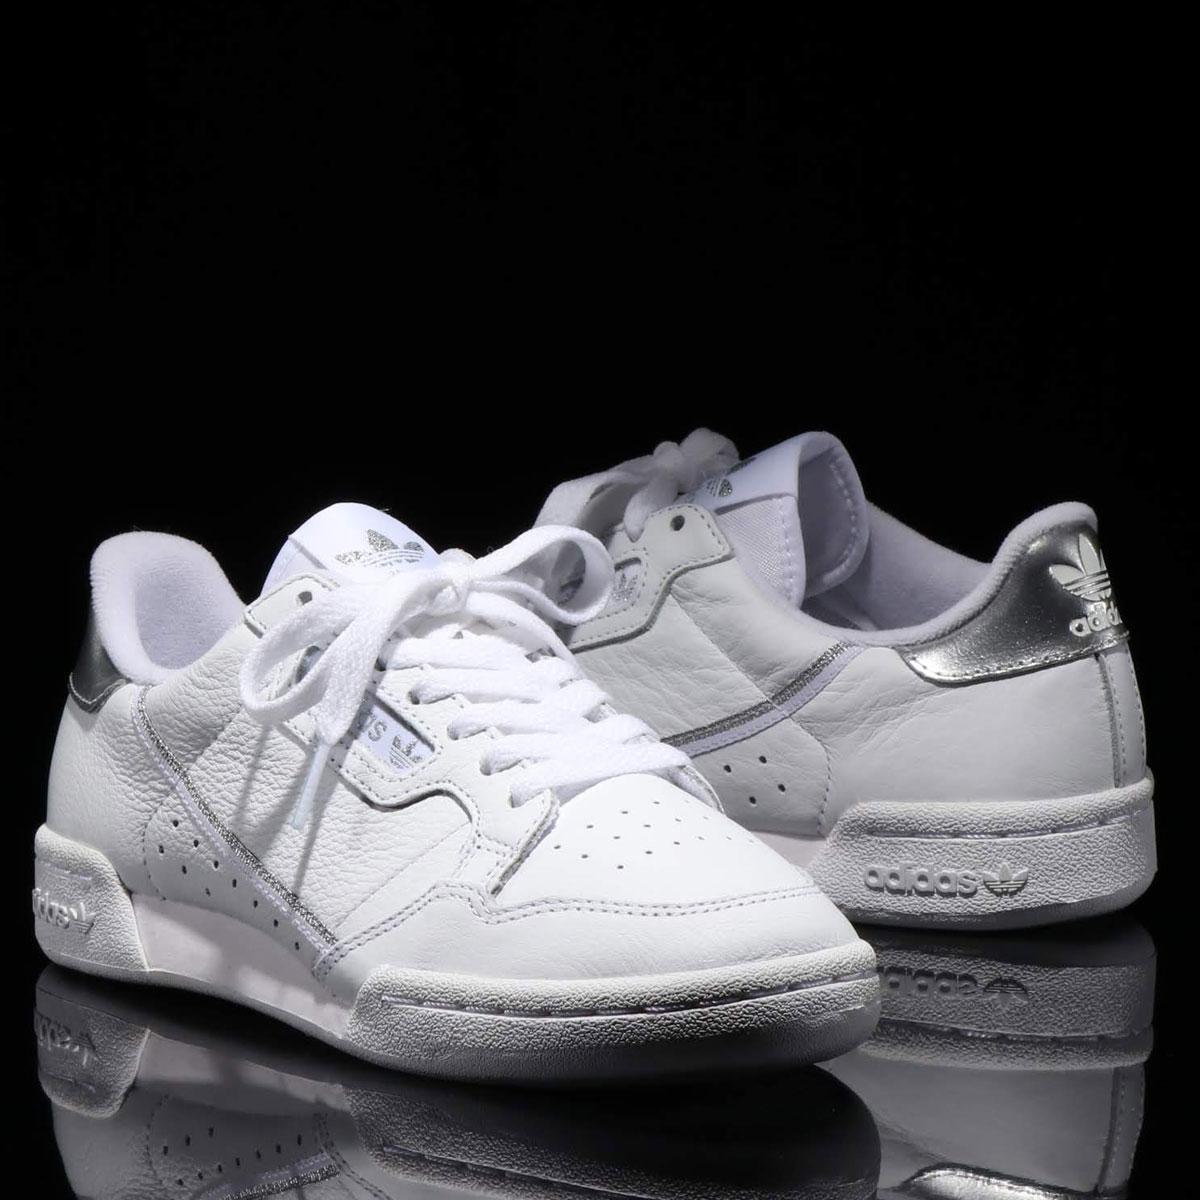 adidas Originals CONTINENTAL 80(アディダスオリジナルス コンチネンタル 80)RUNNING WHITE/RUNNING WHITE/SILVER MET【メンズ レディース スニーカー】19SS-I